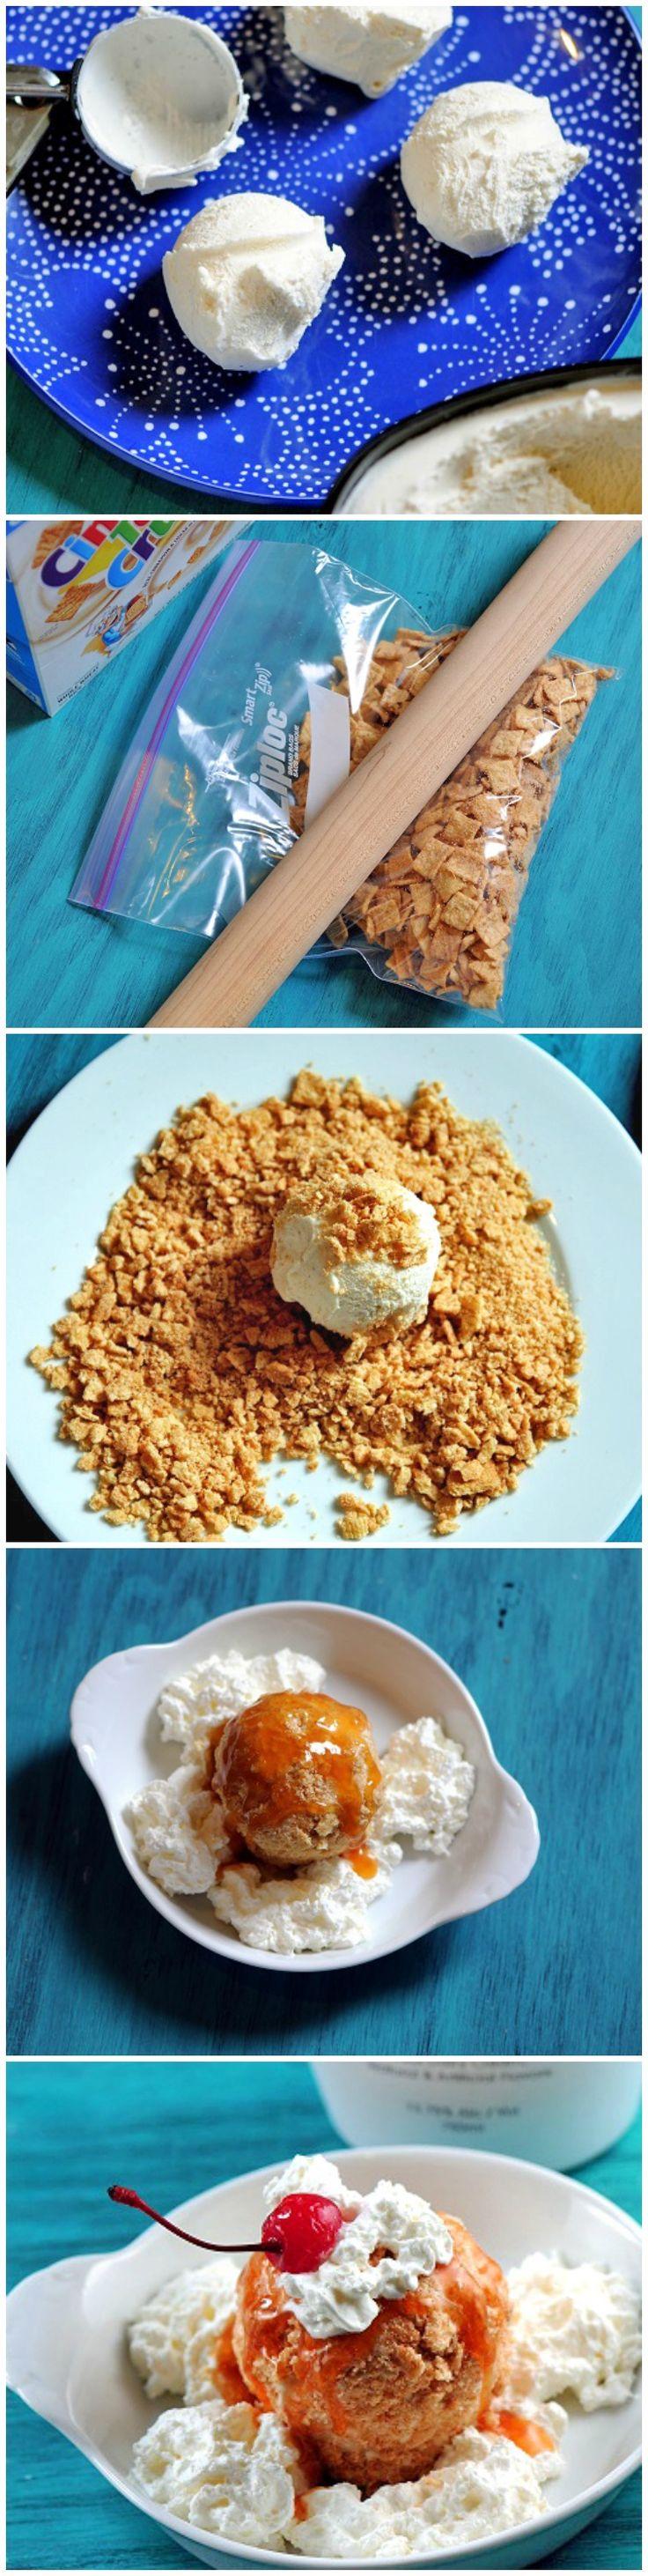 "Cinnamon Toast Crunch ""Fried"" Ice Cream"